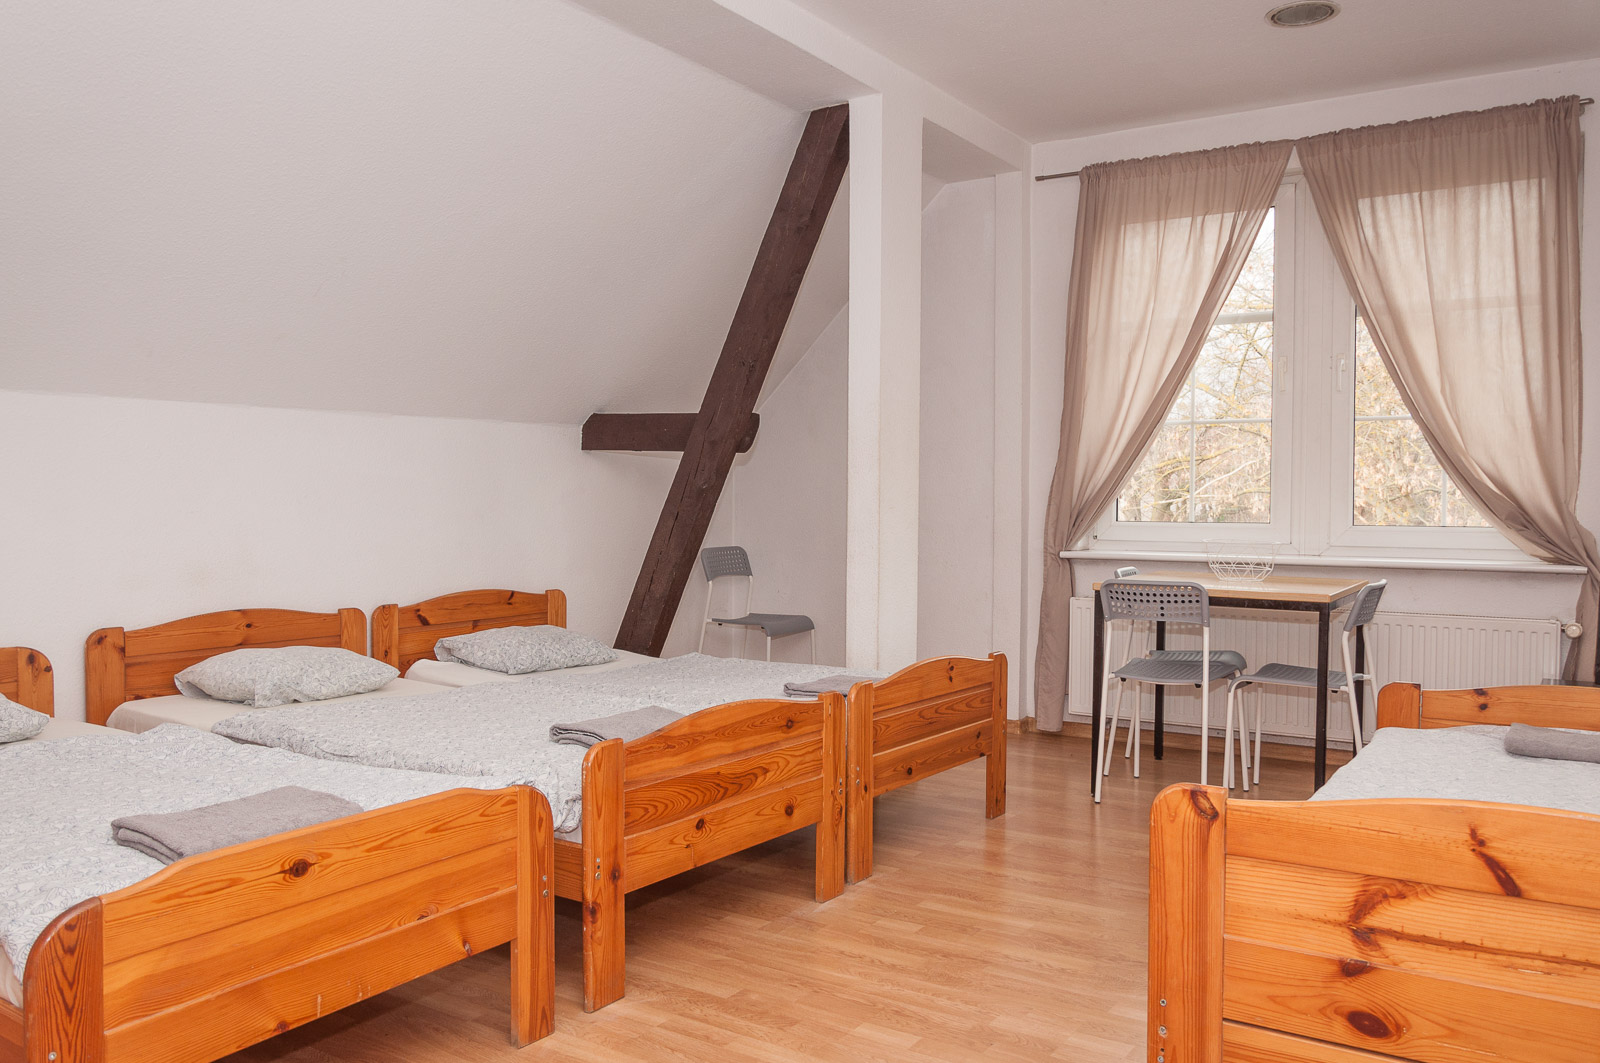 pokoje-na-wynajem-gdansk-jelitkowo_zlota-plaza_zp00_ad025570